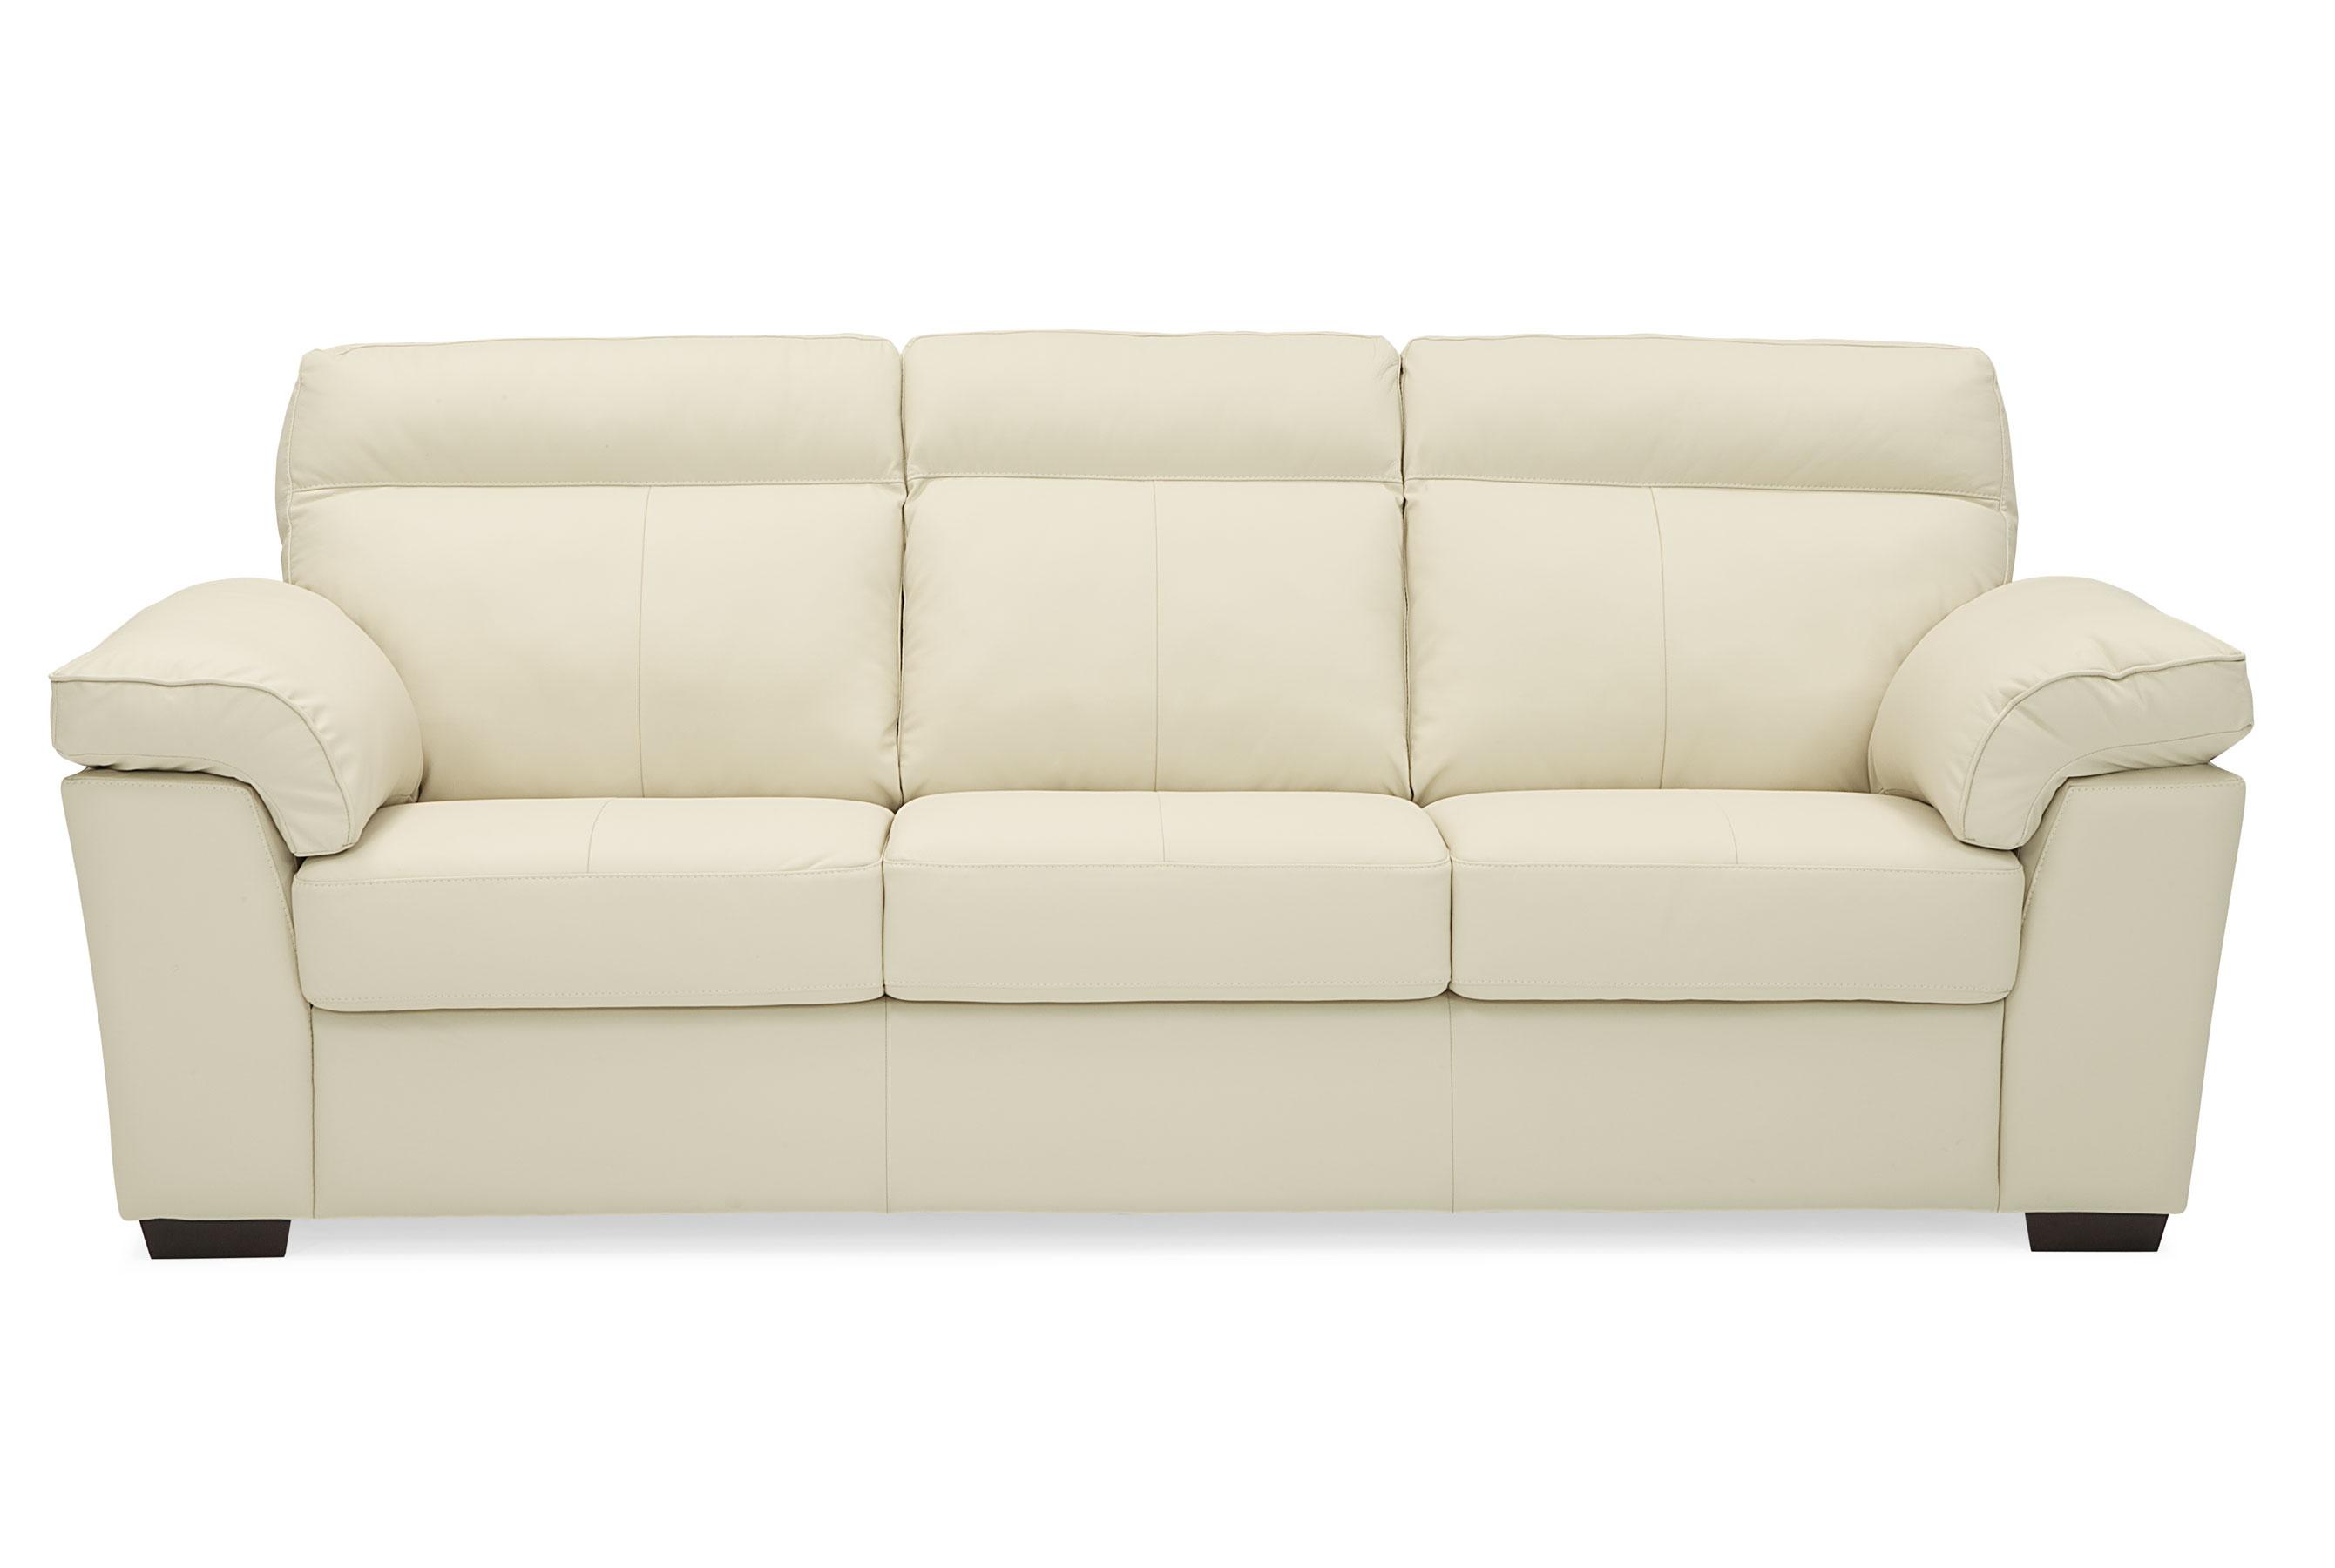 Kingston 77491 94 Sofa Sofas And